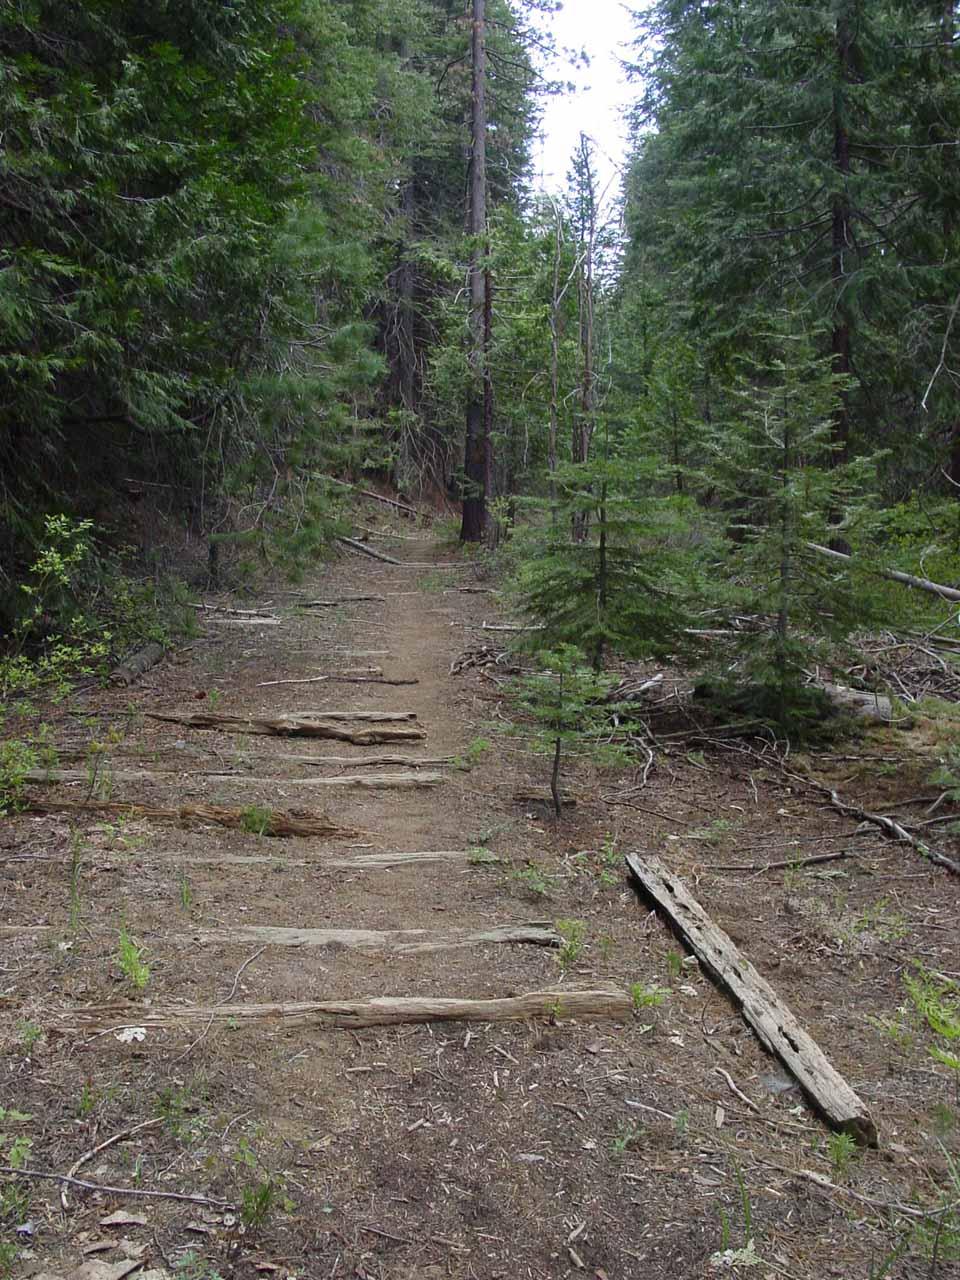 Railroad tracks on the trail